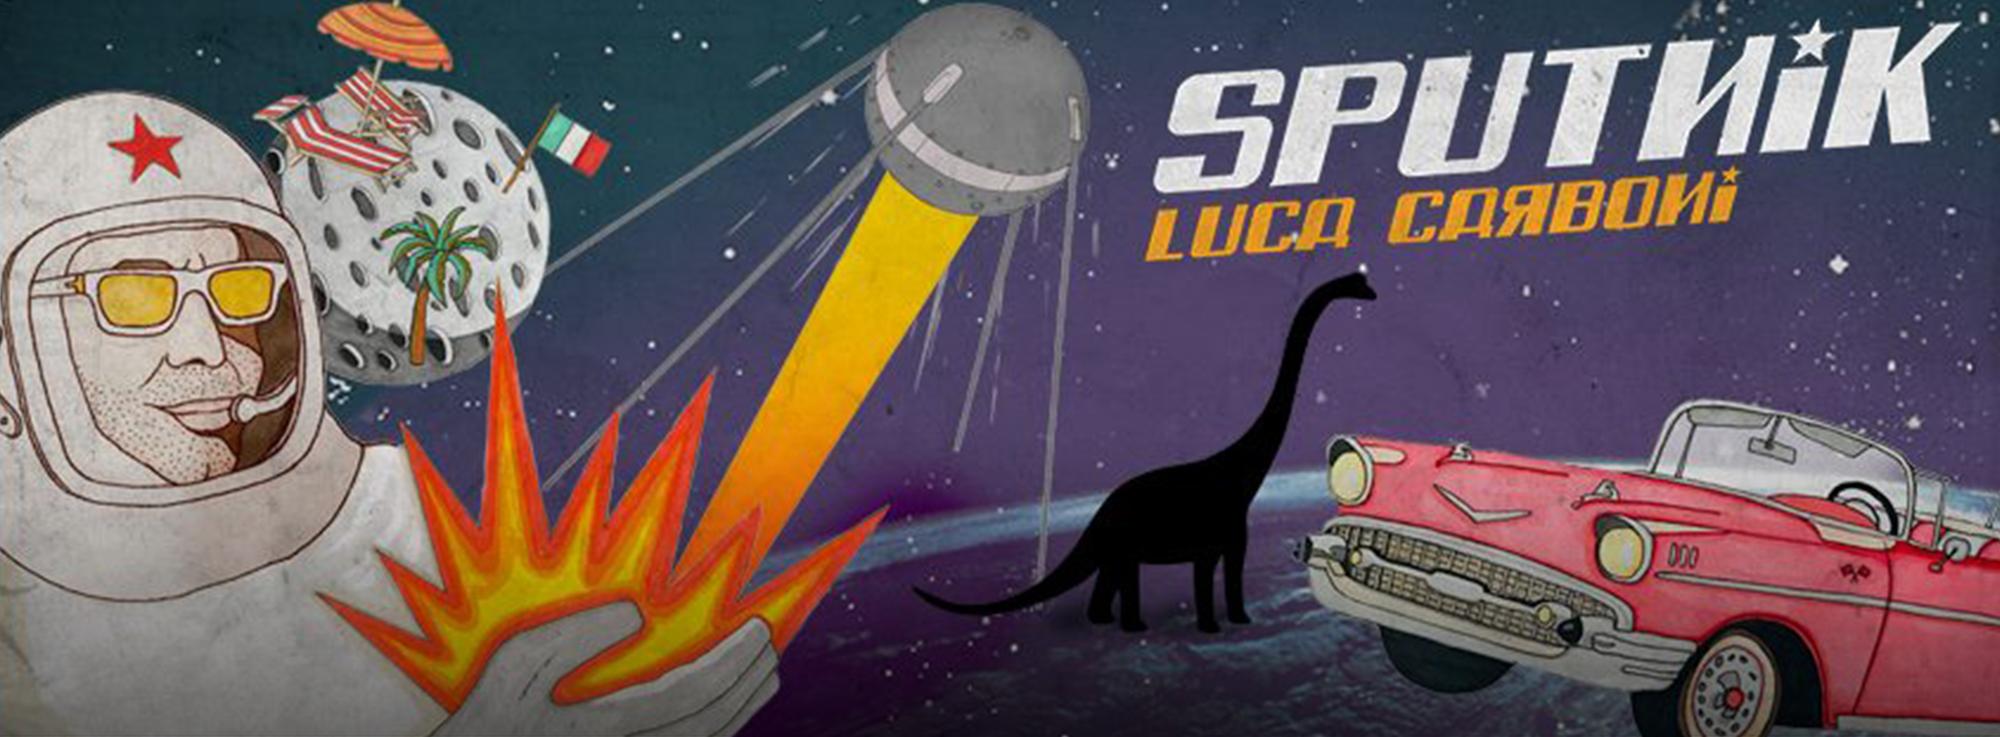 Modugno: Luca Carboni, Sputnik Tour